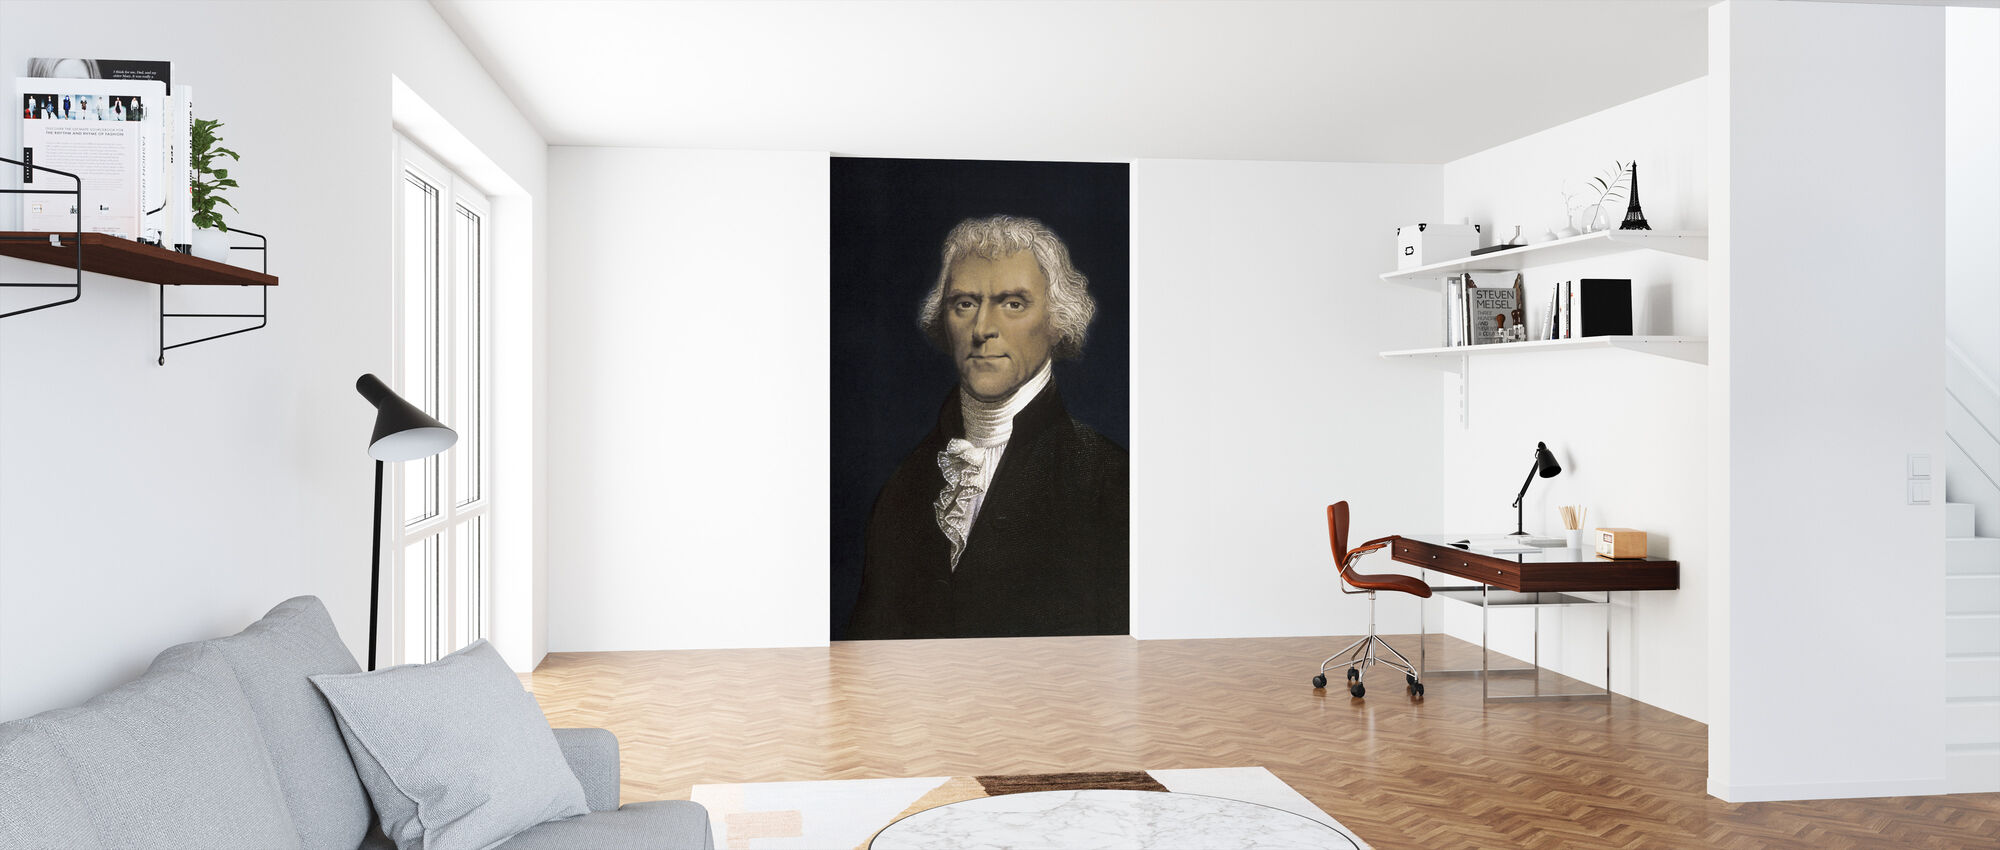 Thomas Jefferson - Wallpaper - Office